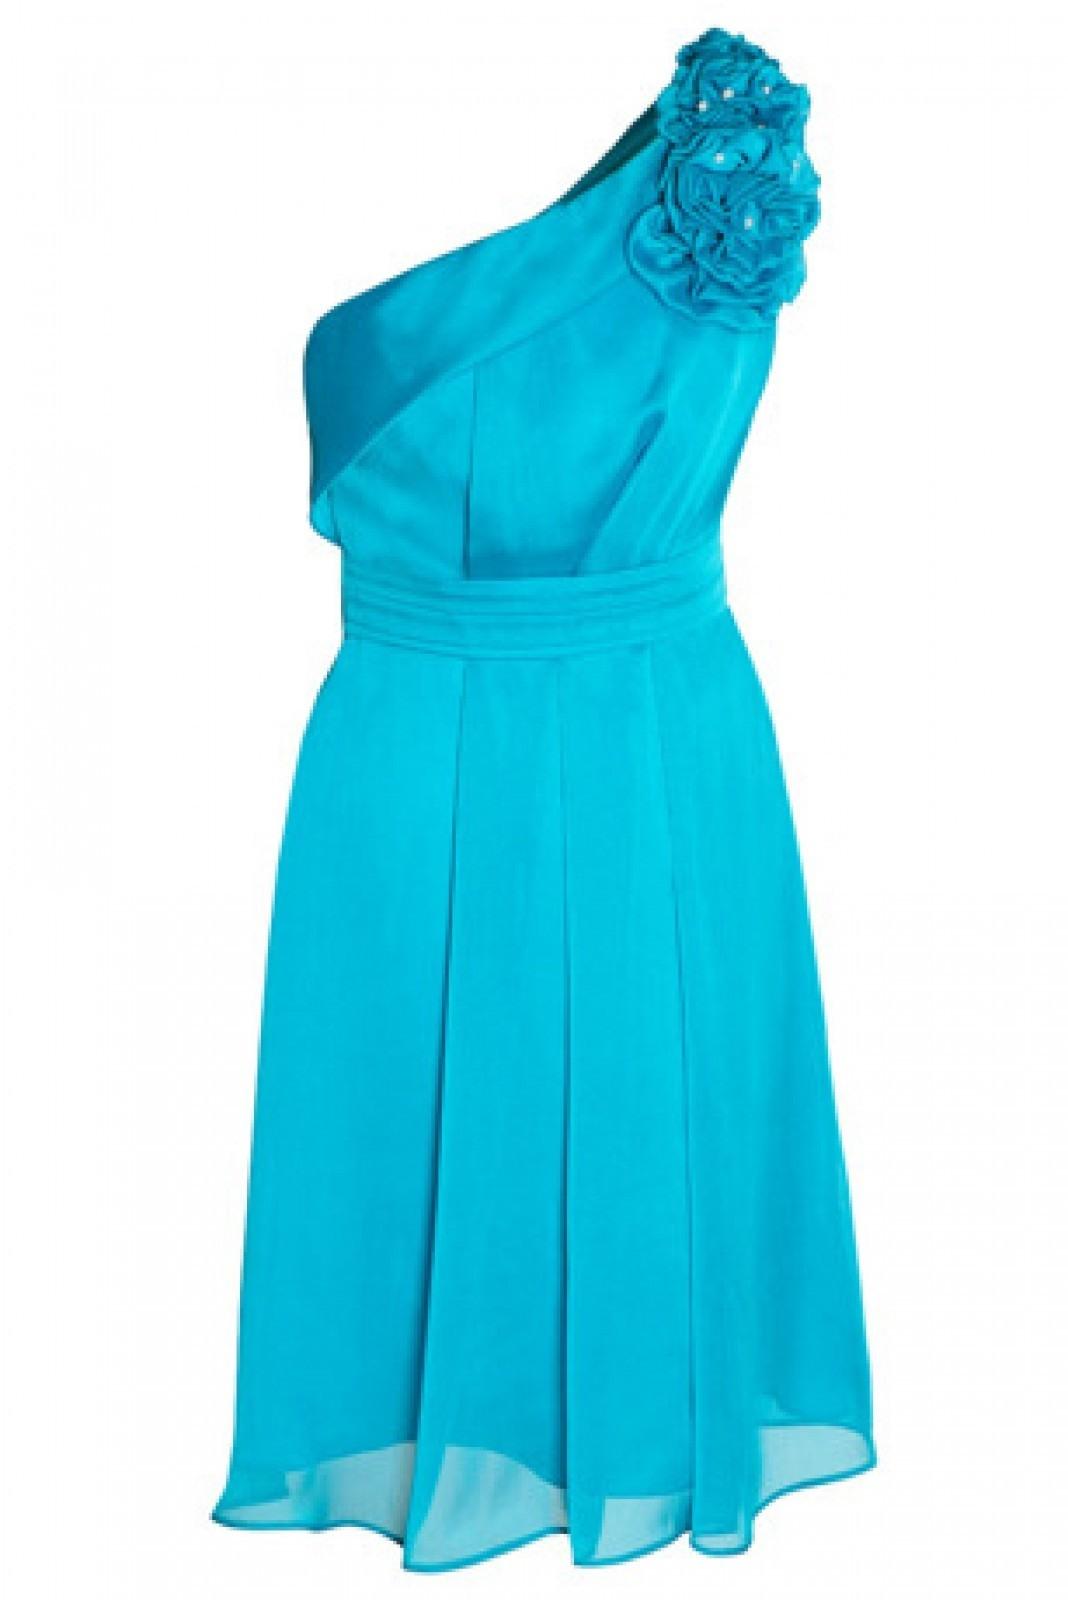 Formal Genial Kleid Türkis für 201917 Elegant Kleid Türkis Boutique